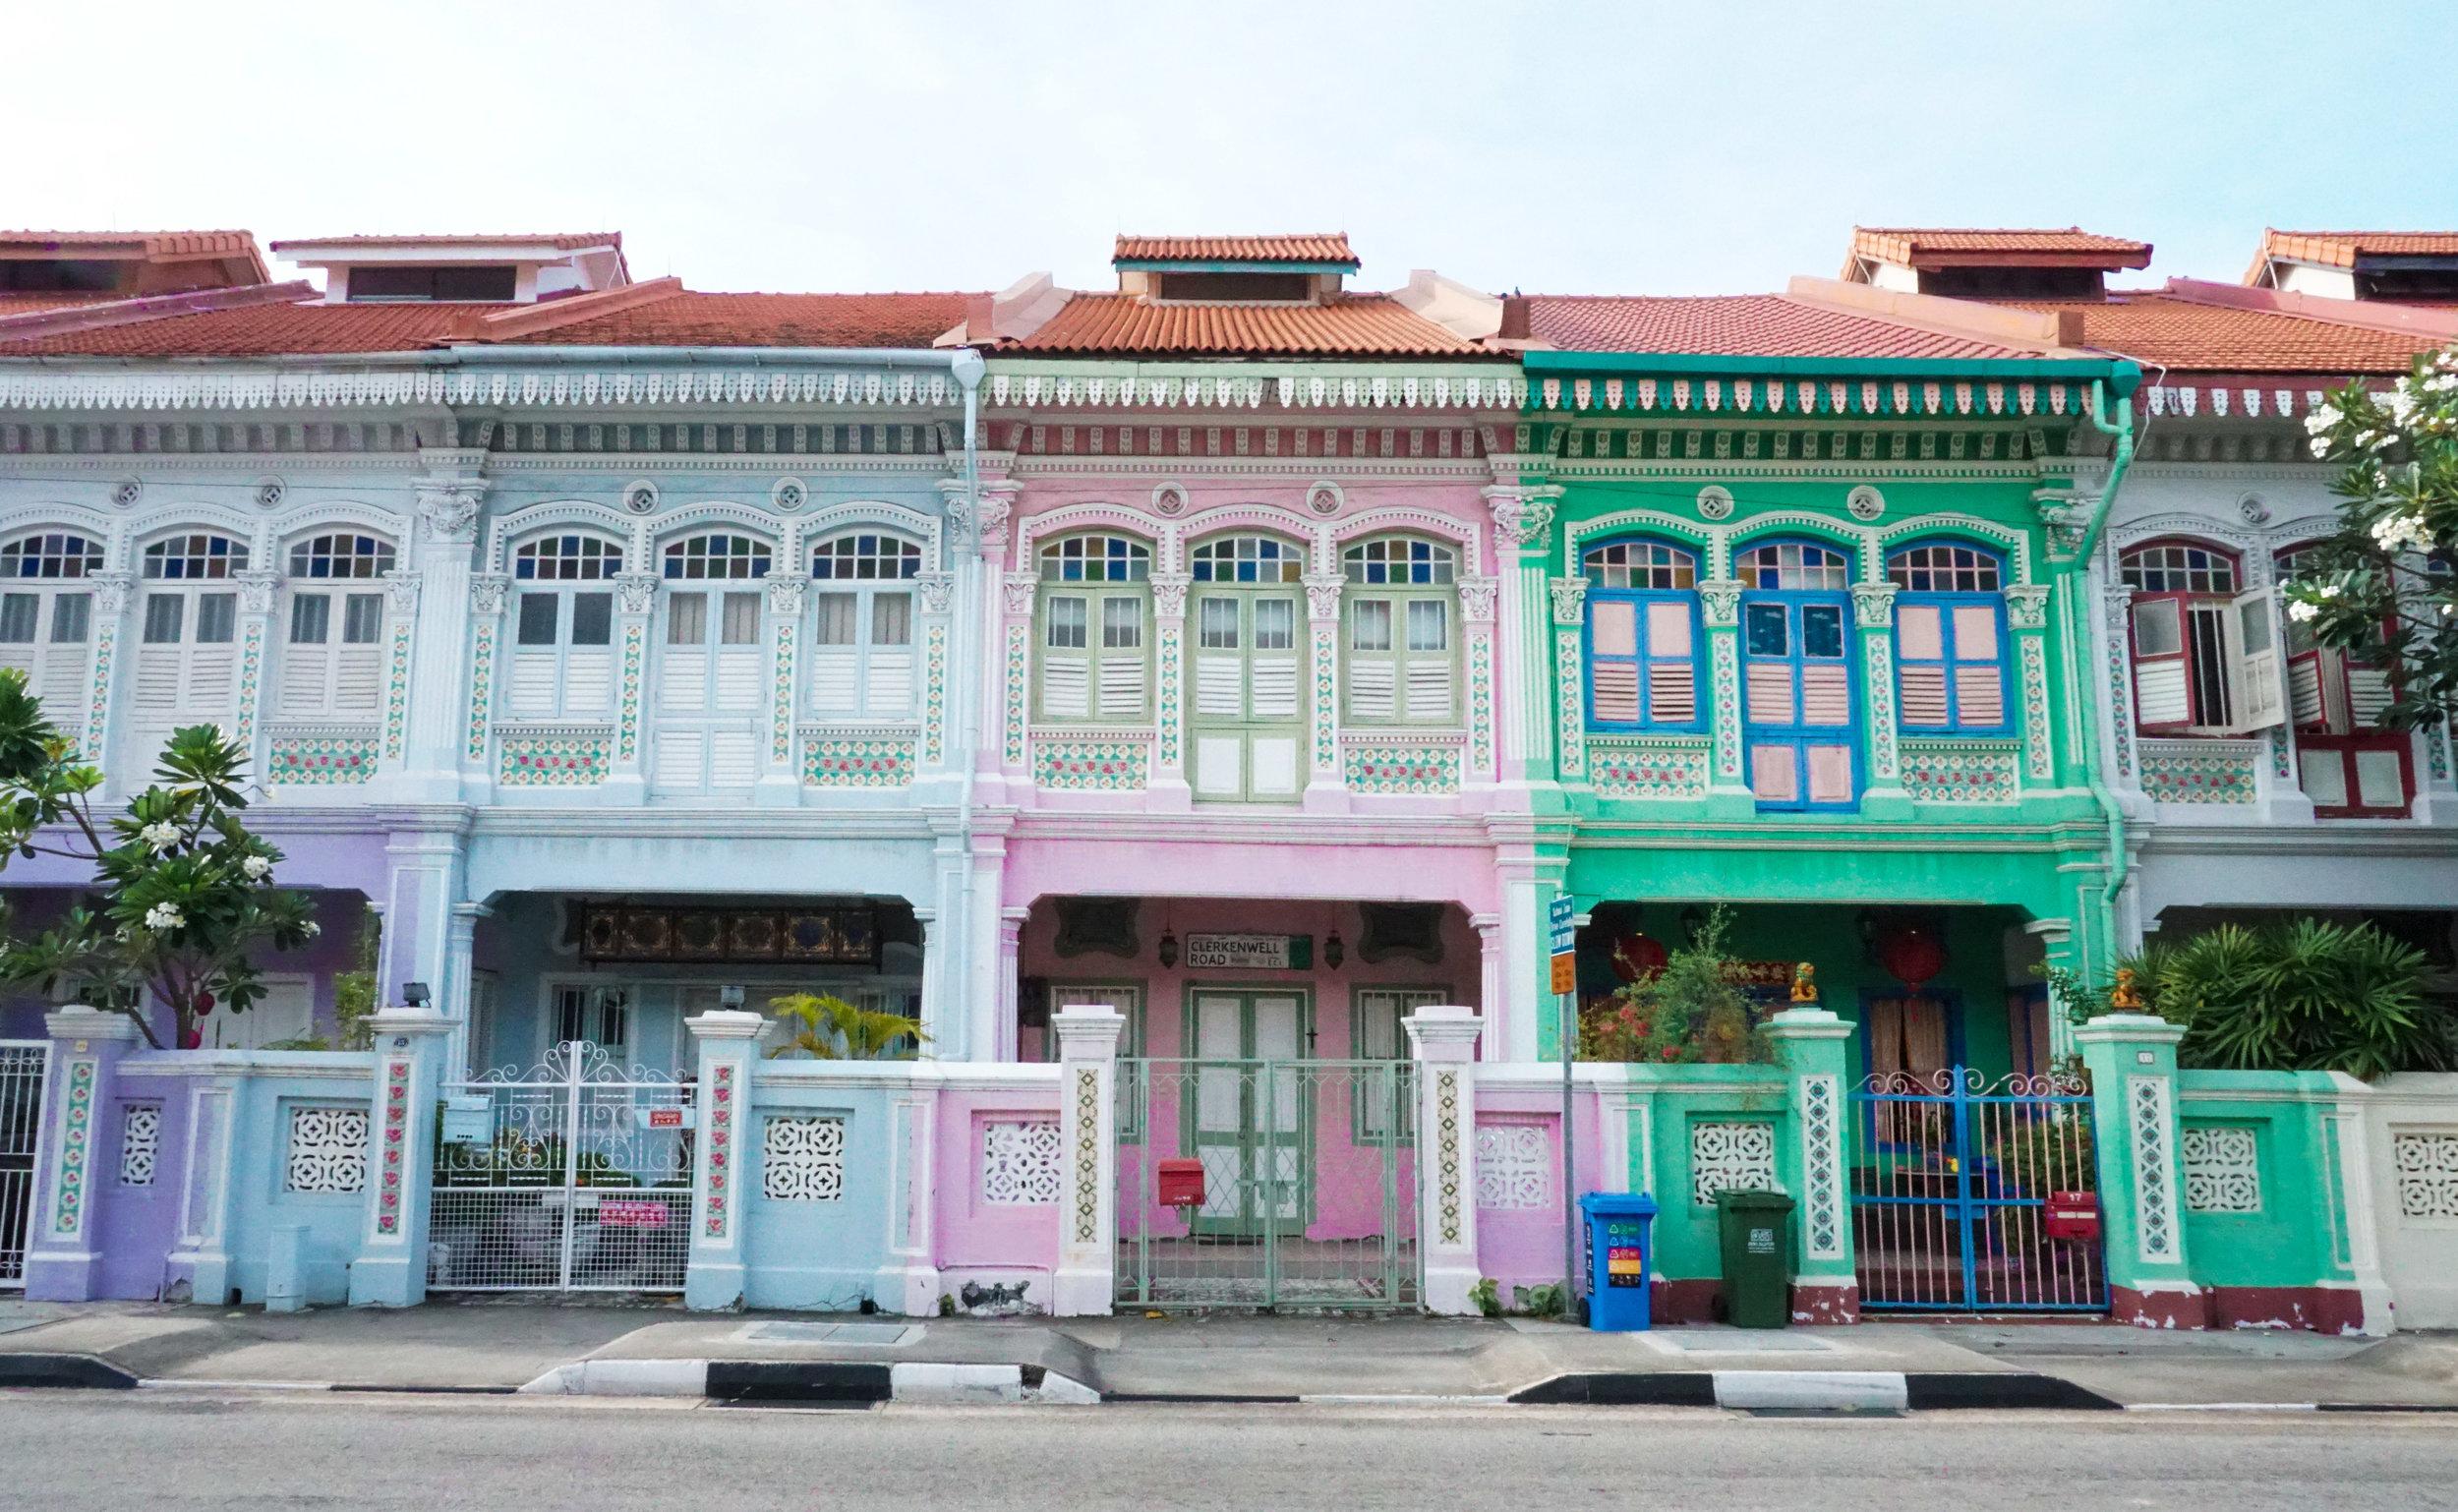 curio.trips.singapore.pastel.row.houses.landscape-2.jpg